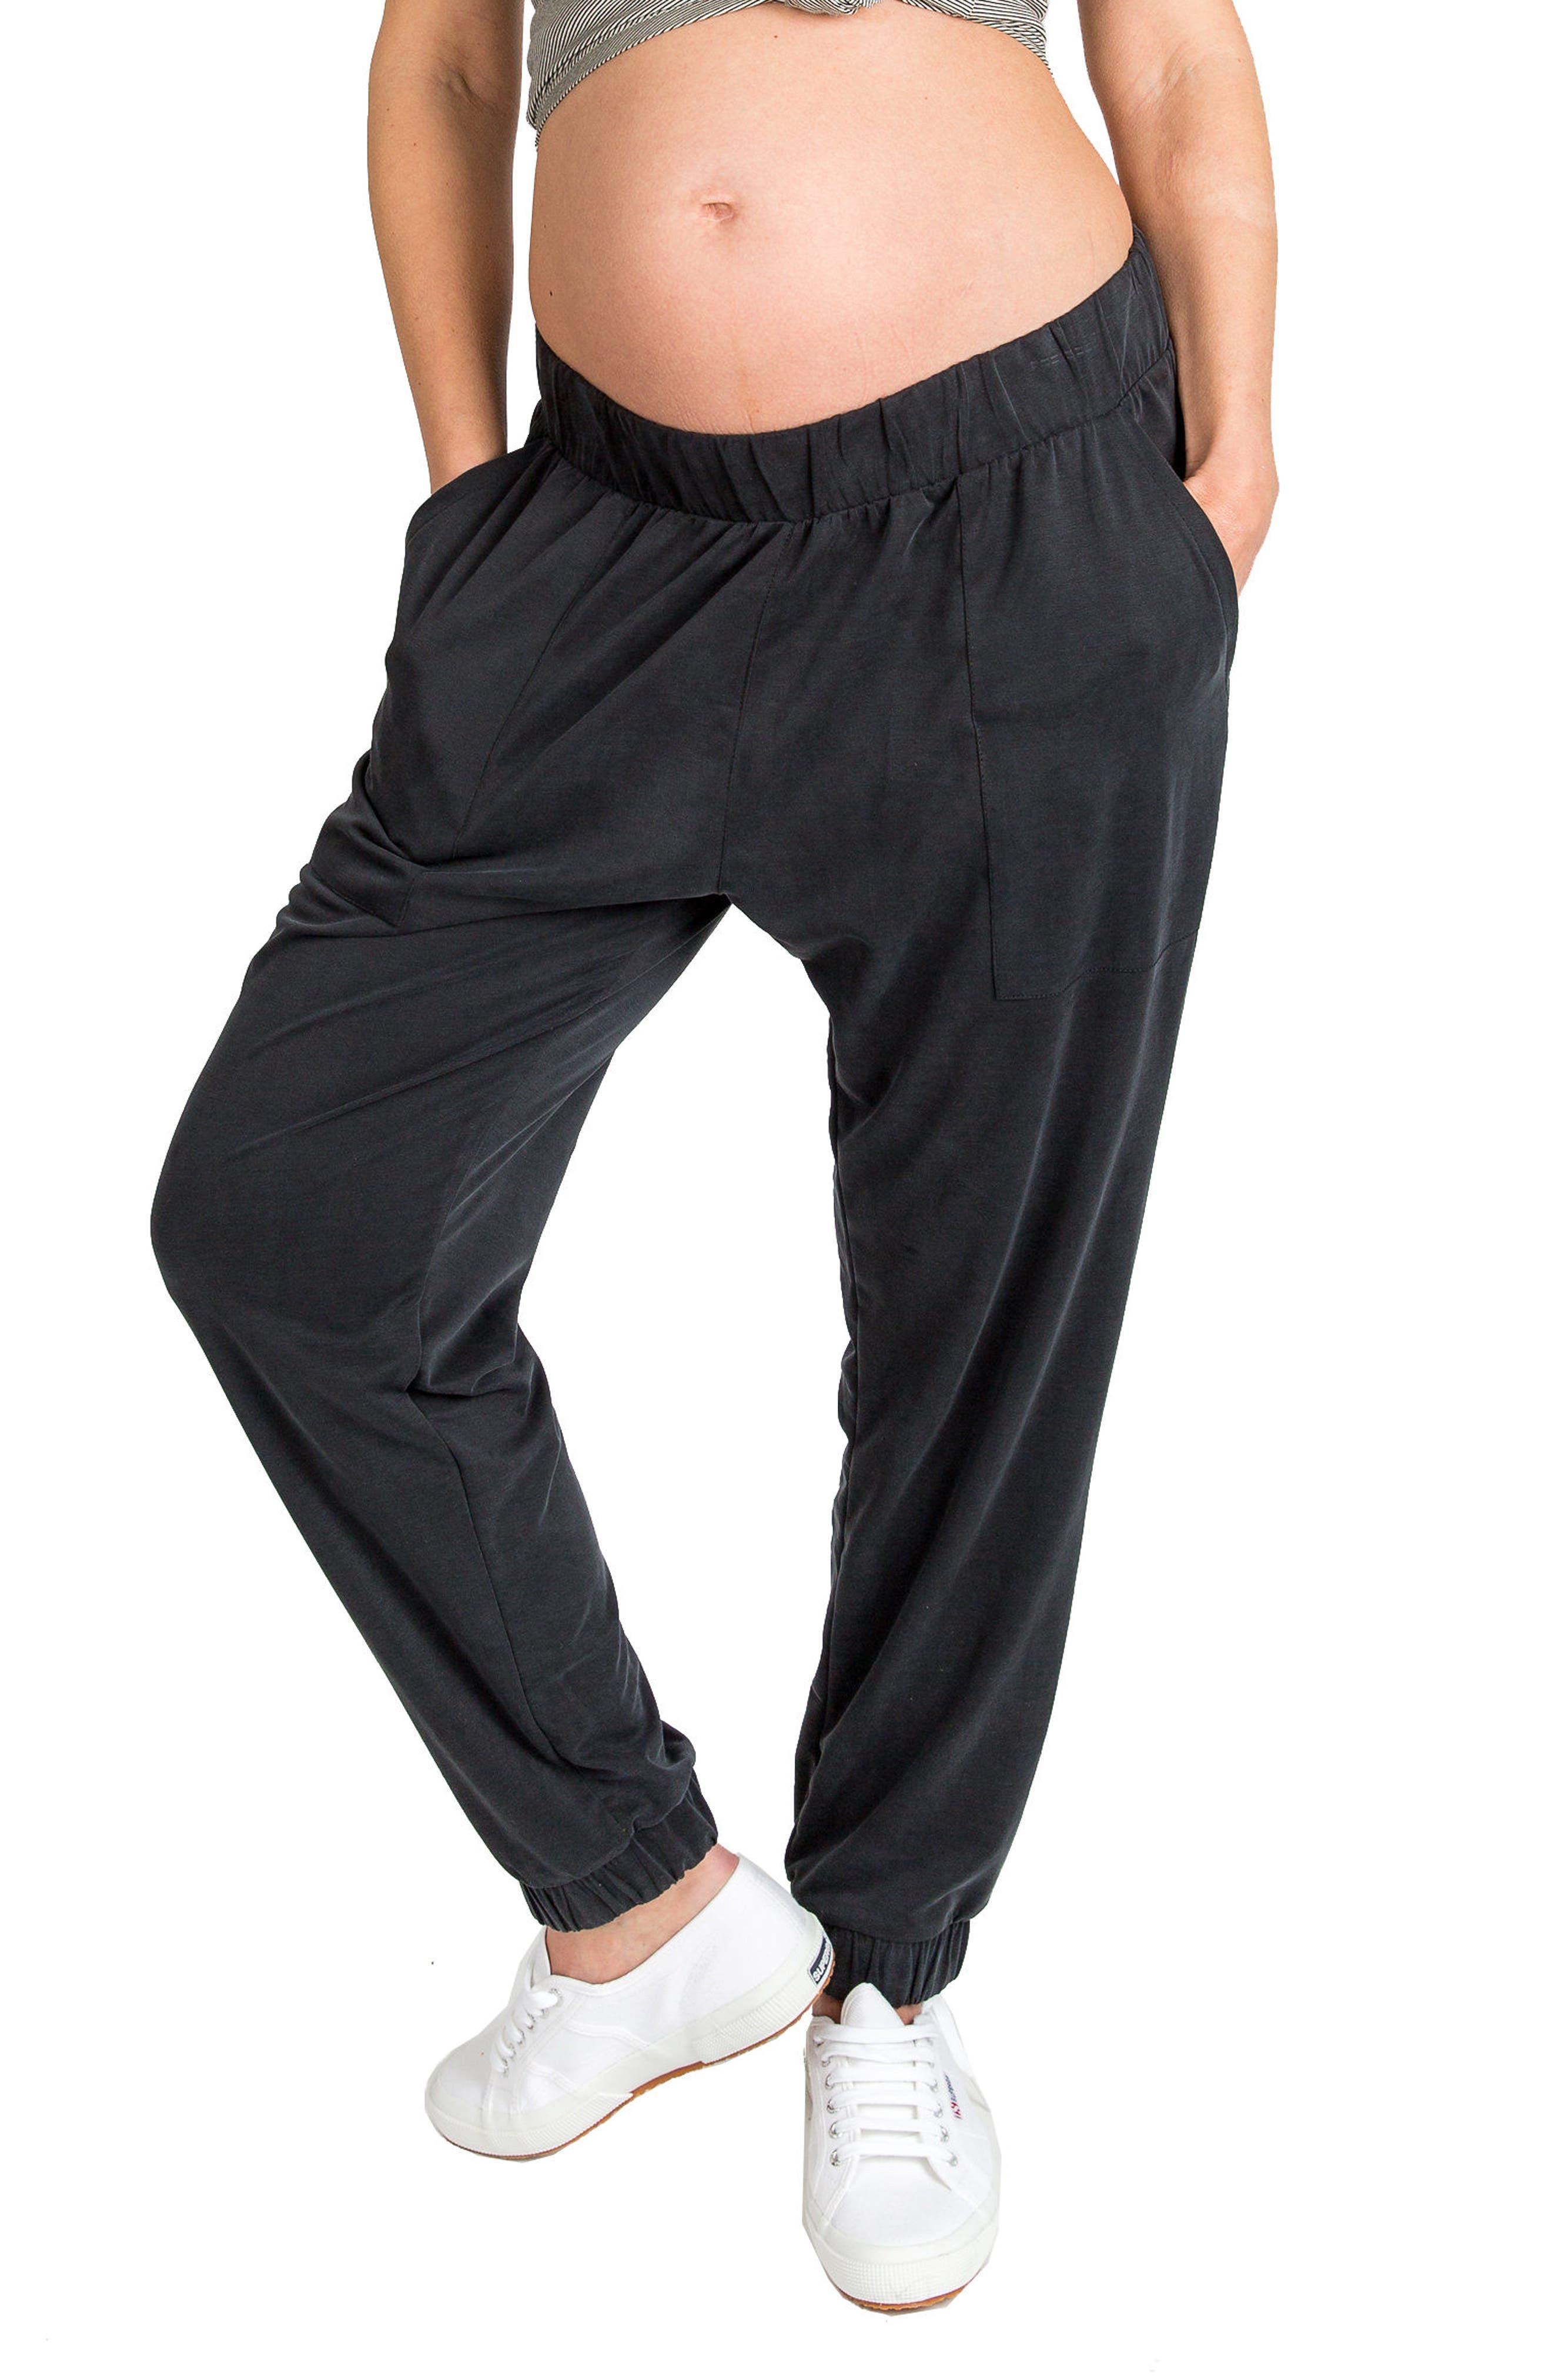 'Jenna' Maternity Pants,                         Main,                         color,